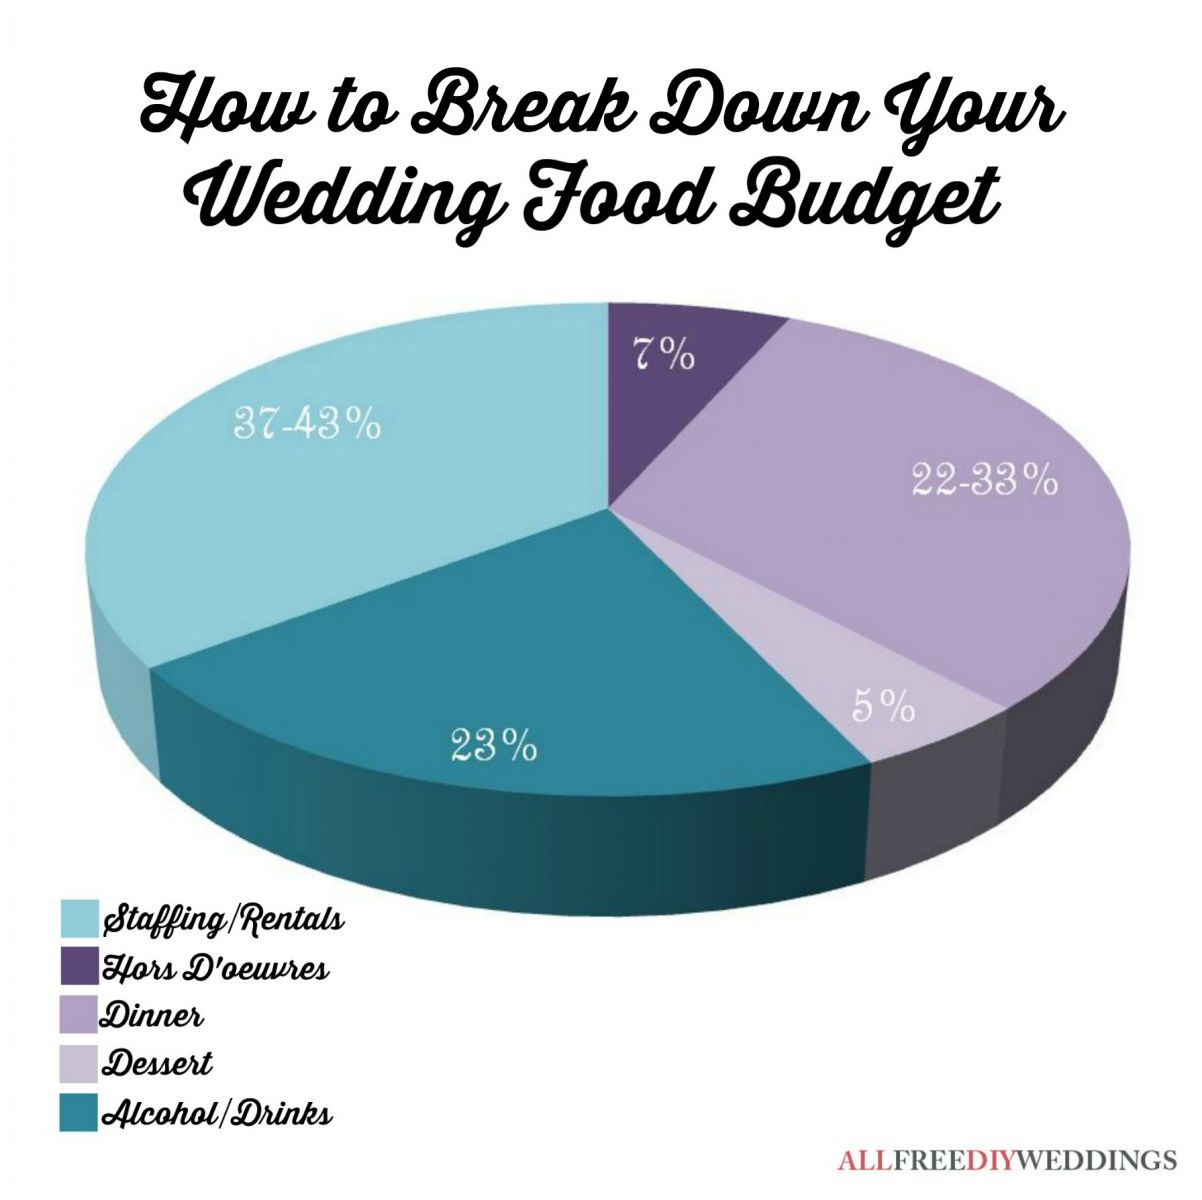 Wedding Budget Breakdown: Food